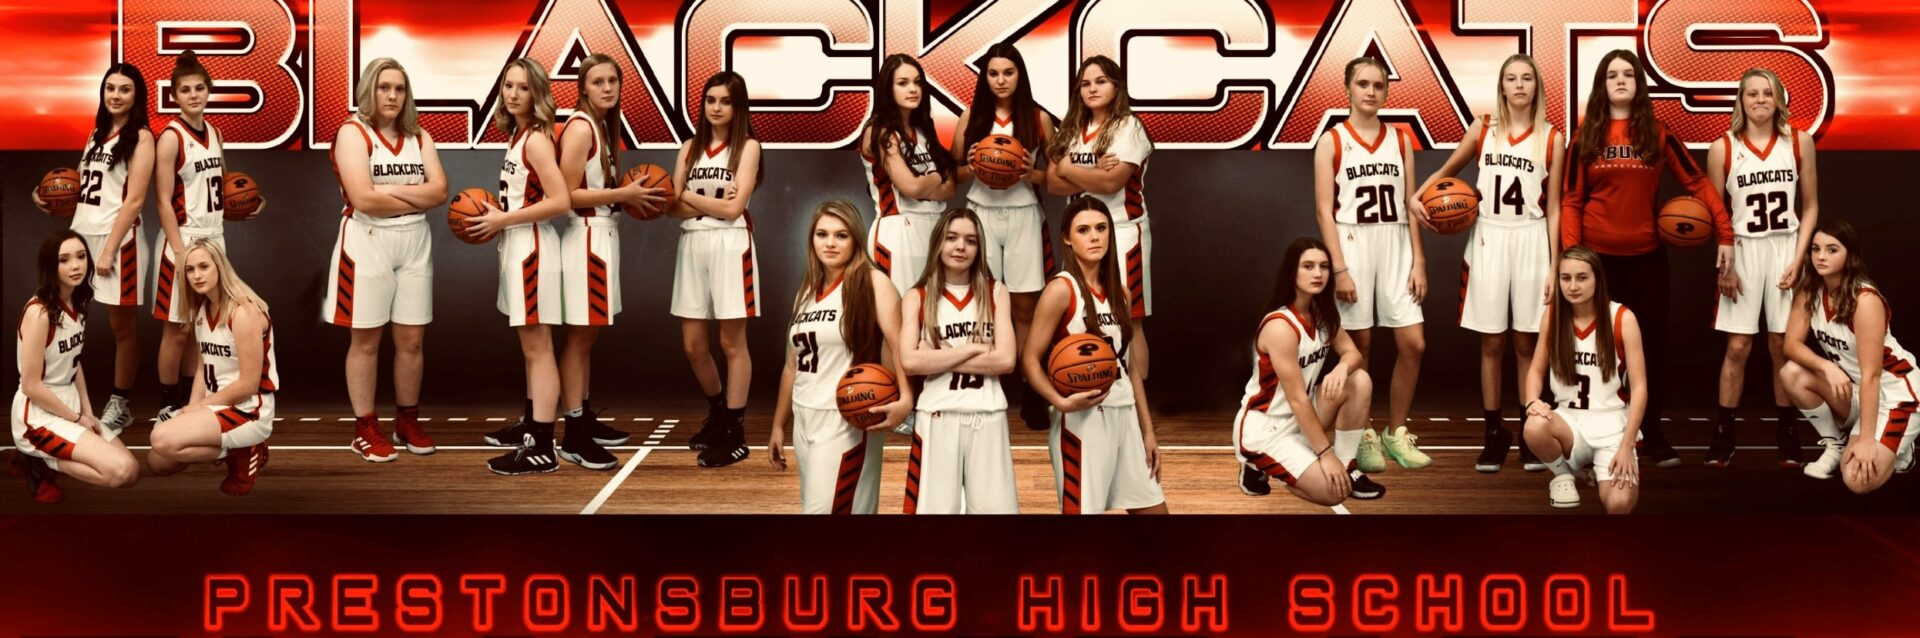 HIGH SCHOOL BASKETBALL: Prestonsburg Lady Blackcats schedule